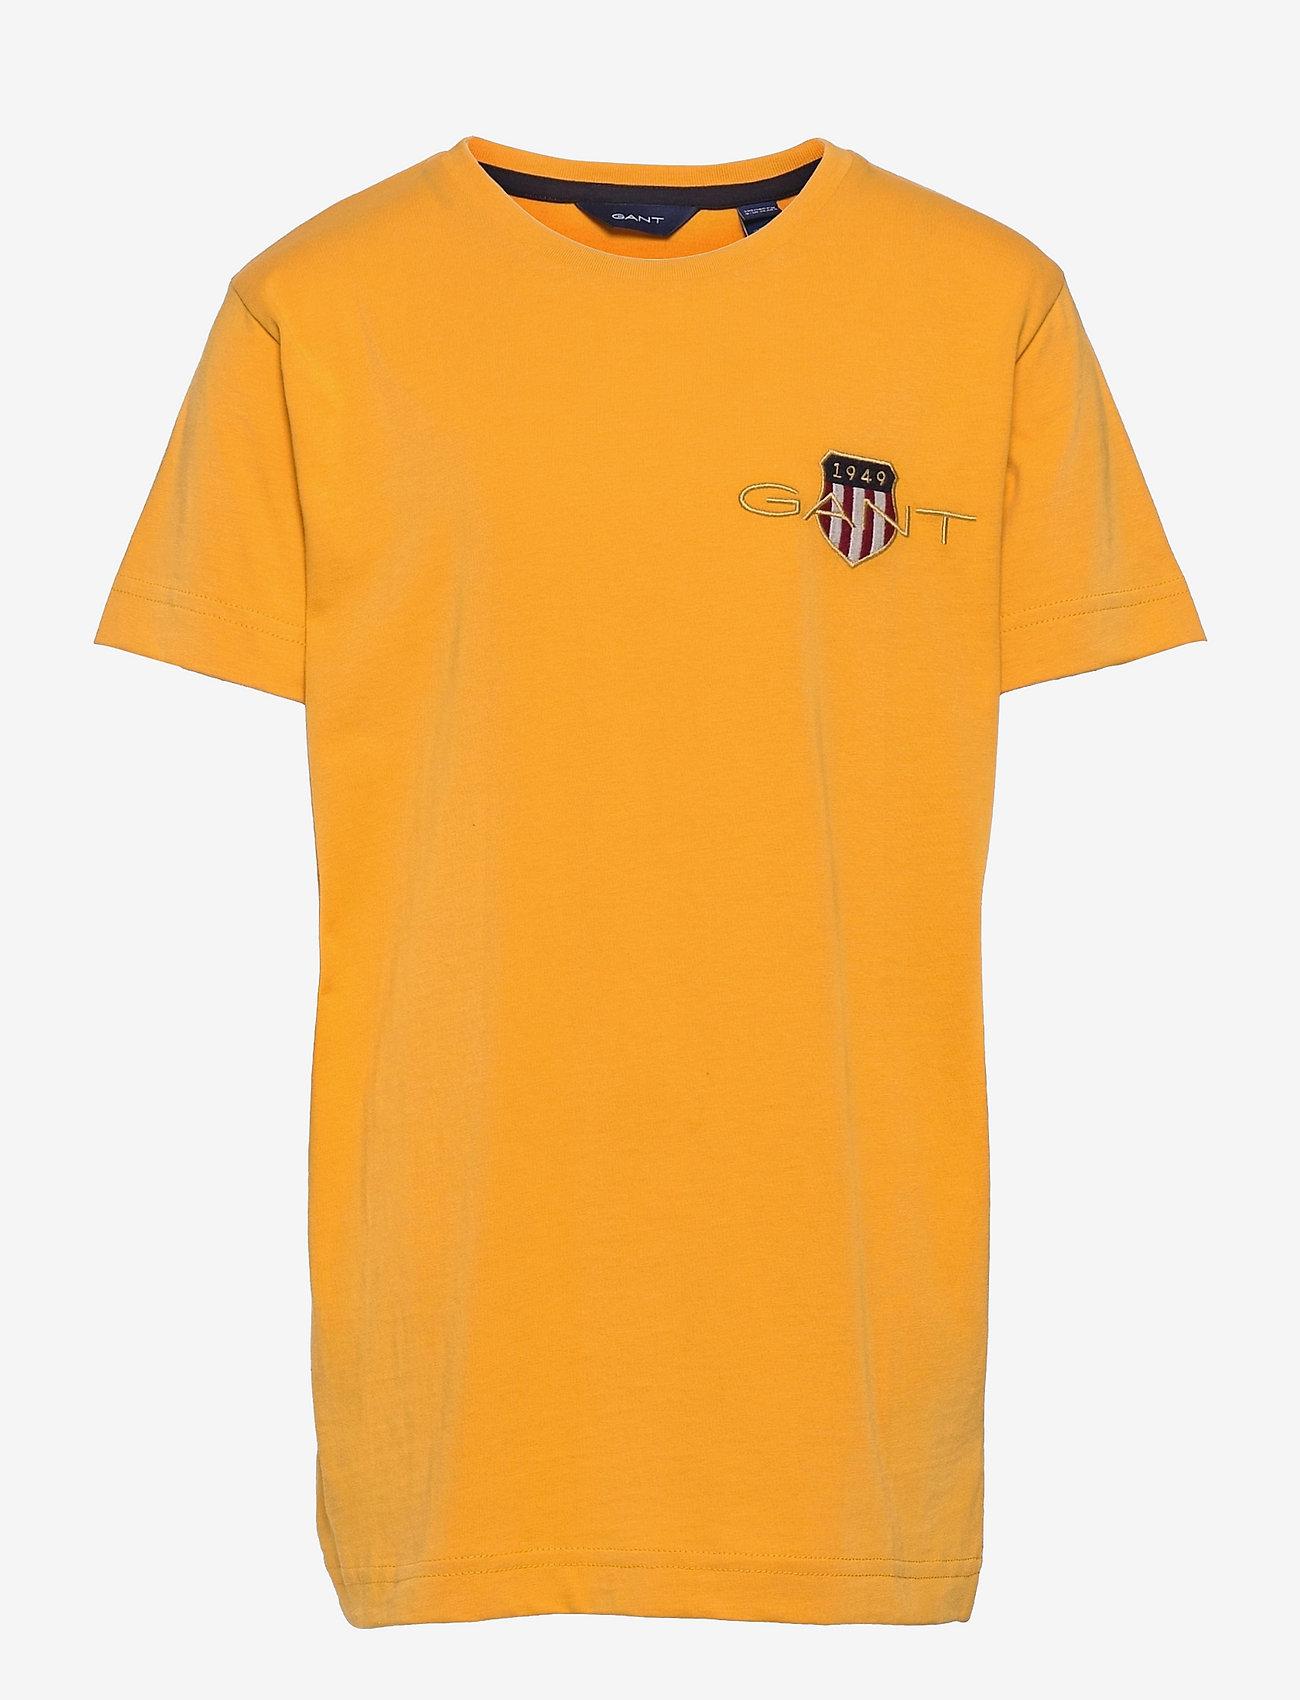 GANT - ARCHIVE SHIELD EMB SS T-SHIRT - short-sleeved - ivy gold - 0